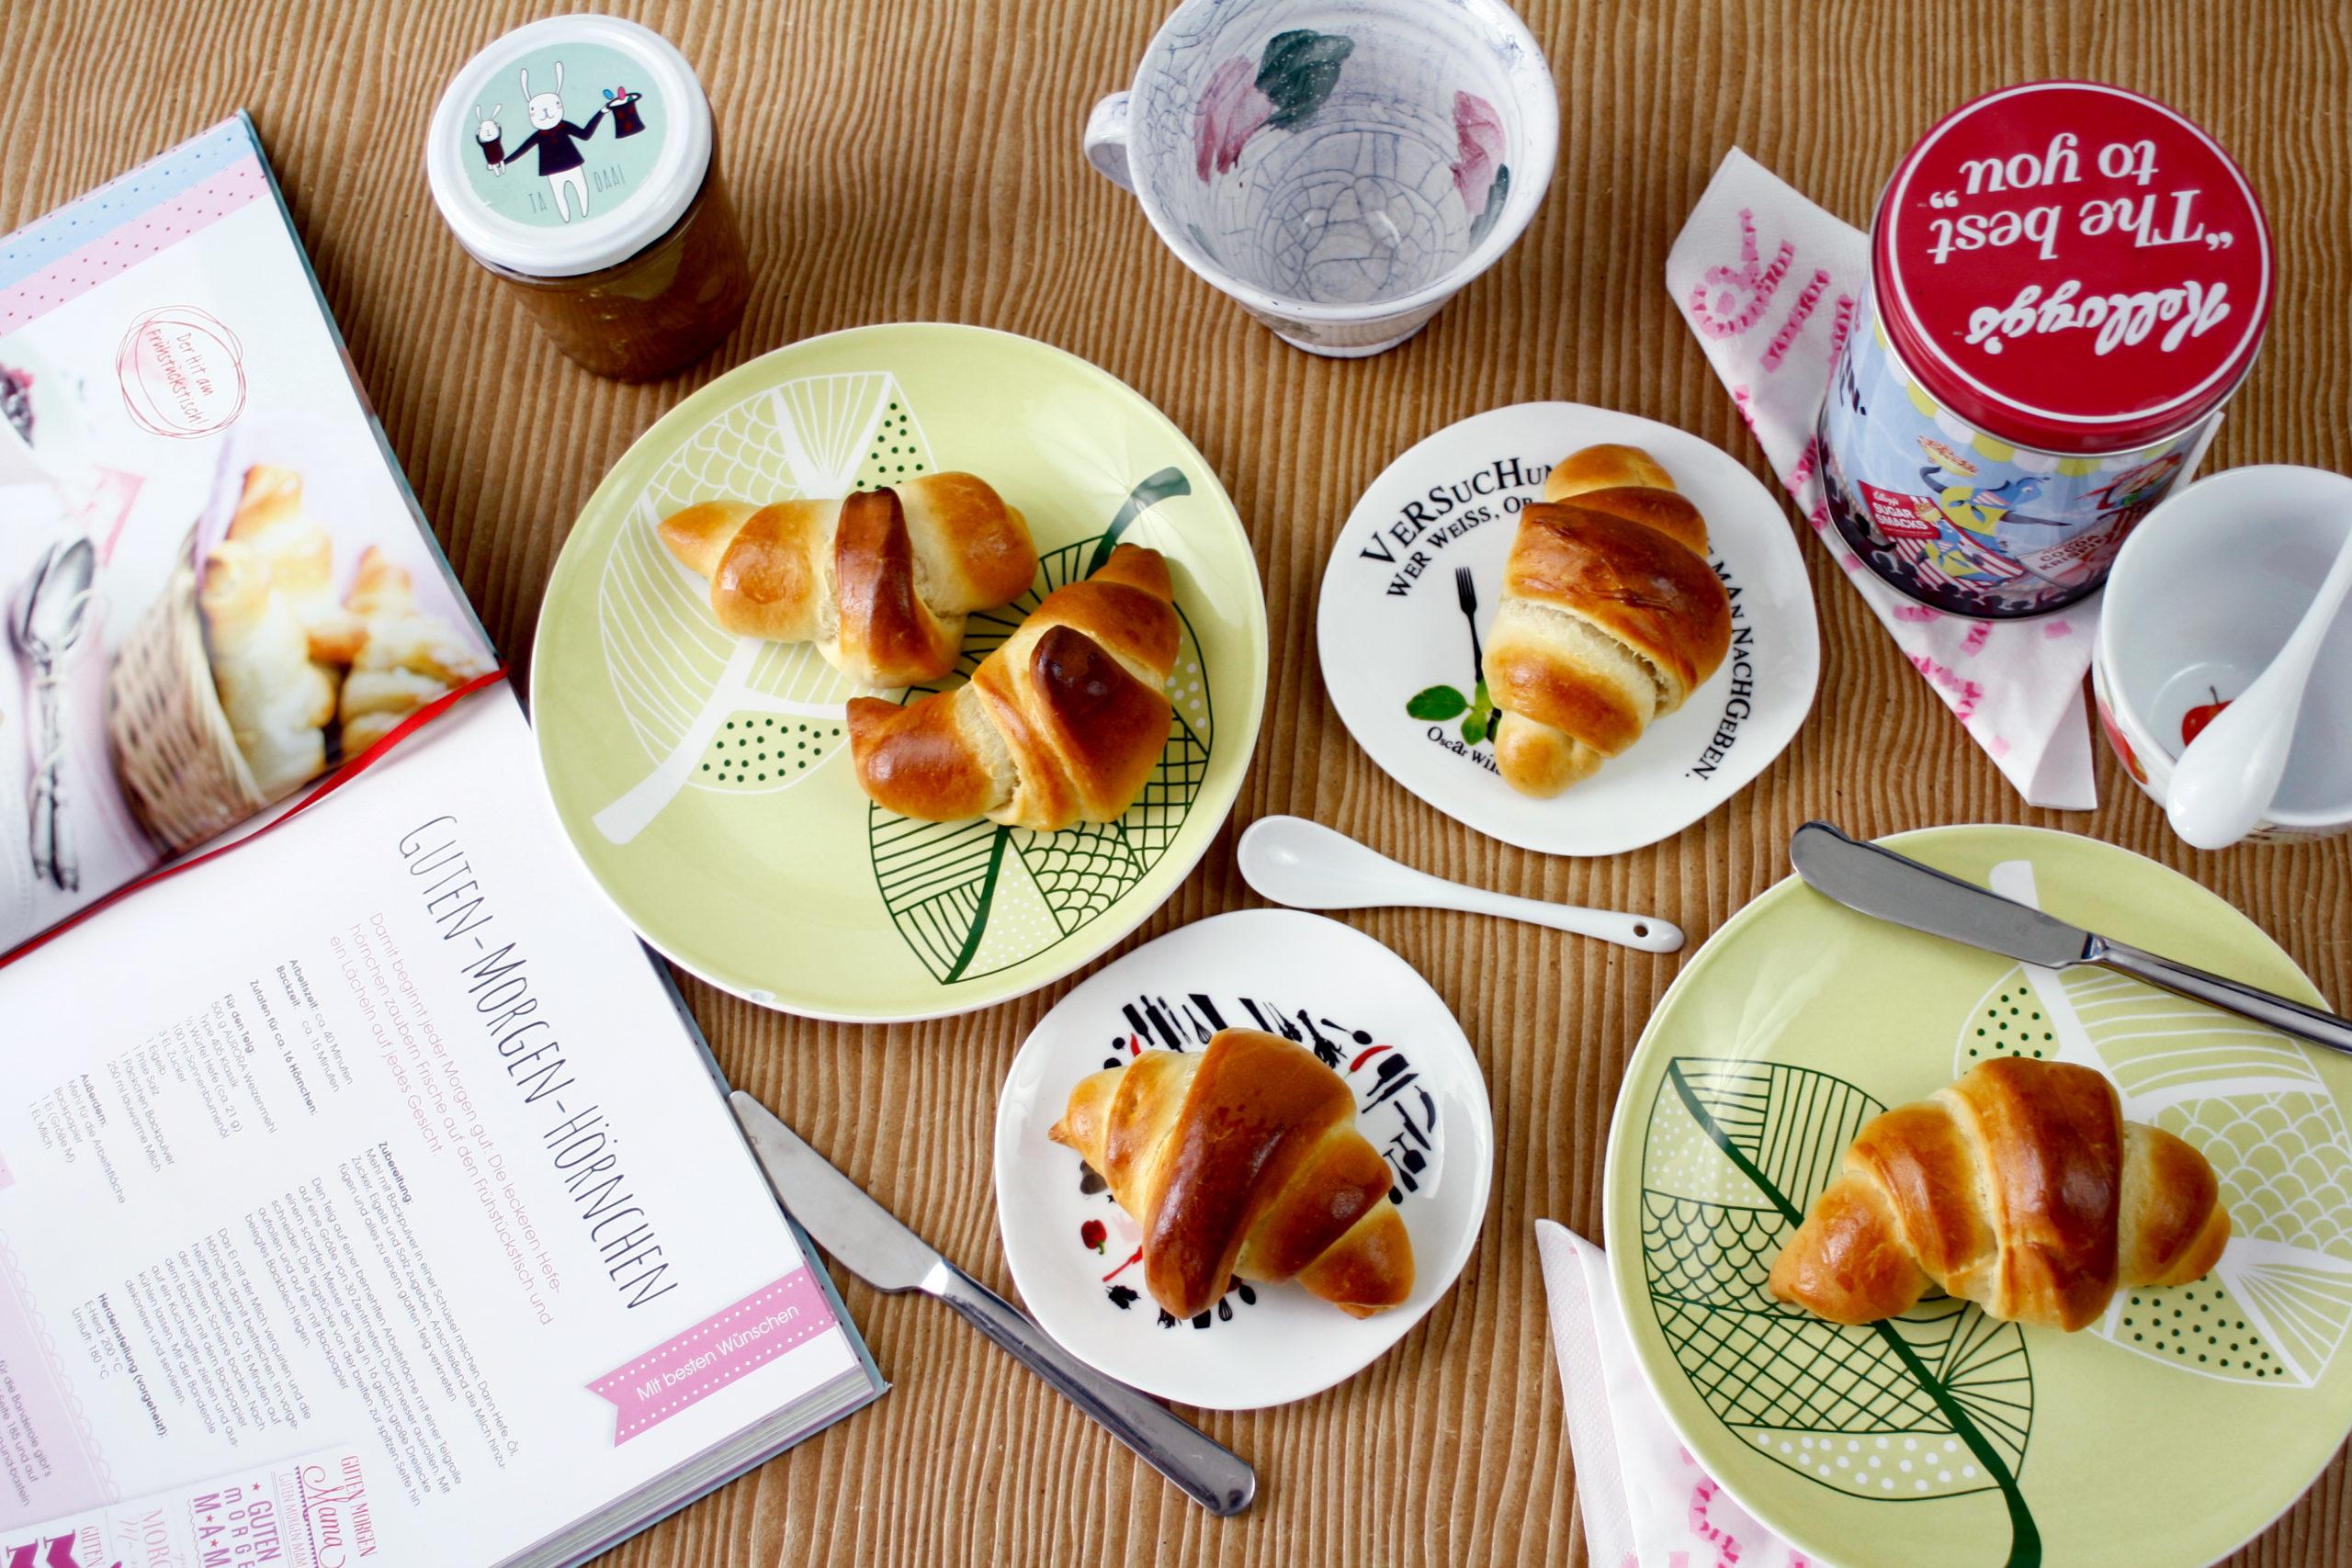 Frühstückshörnchen // Breakfast Rolls by http://babyrockmyday.com/fruehstueckshoernchen/ 